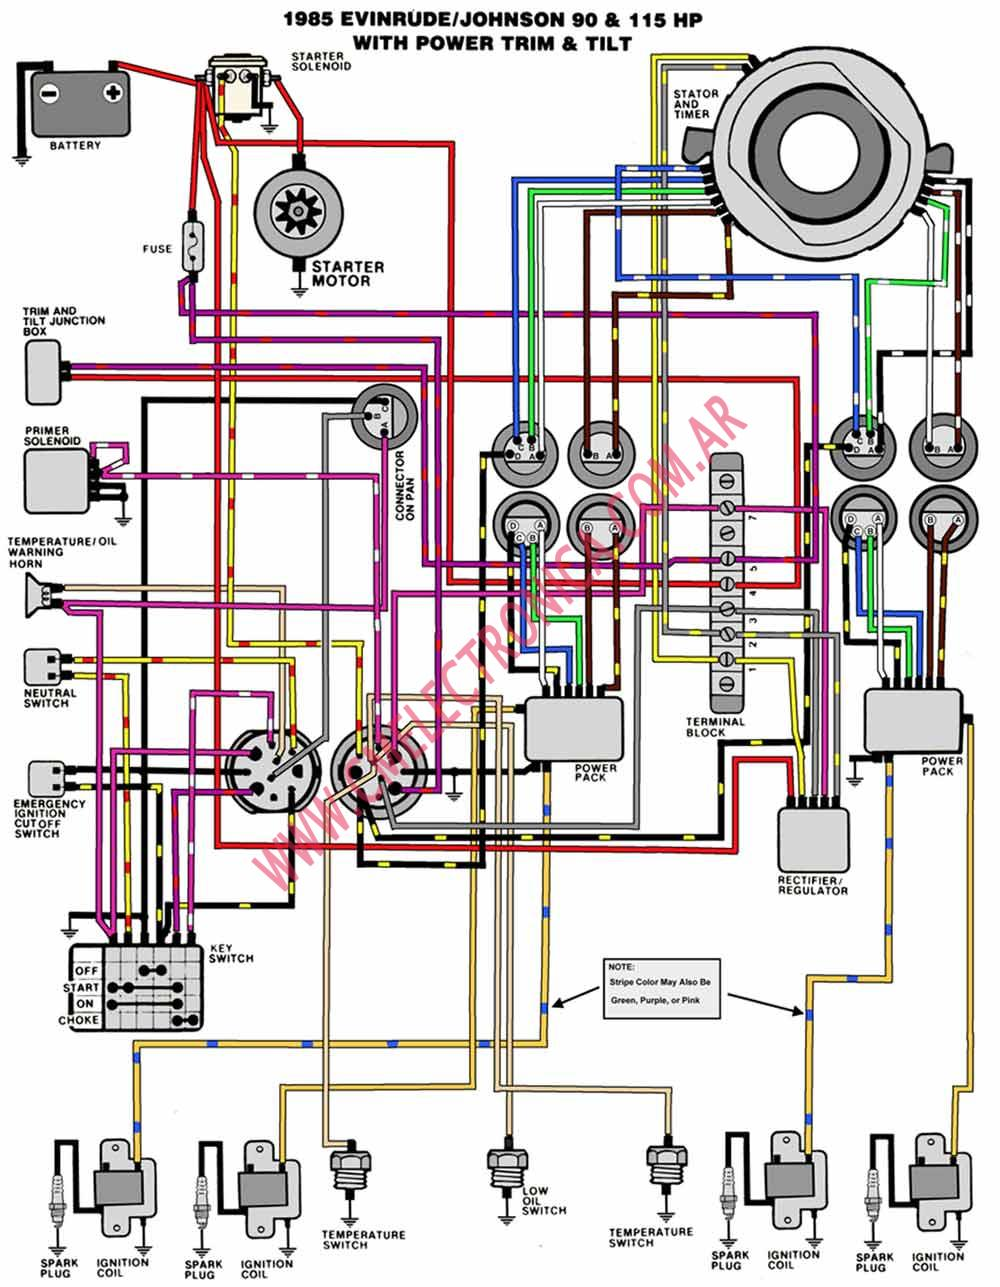 evinrude_johnson 1985_90_115 tnt?resize\\\=665%2C856 mercury optimax wiring diagram mercury verado wiring diagram mercury optimax wiring diagram at eliteediting.co